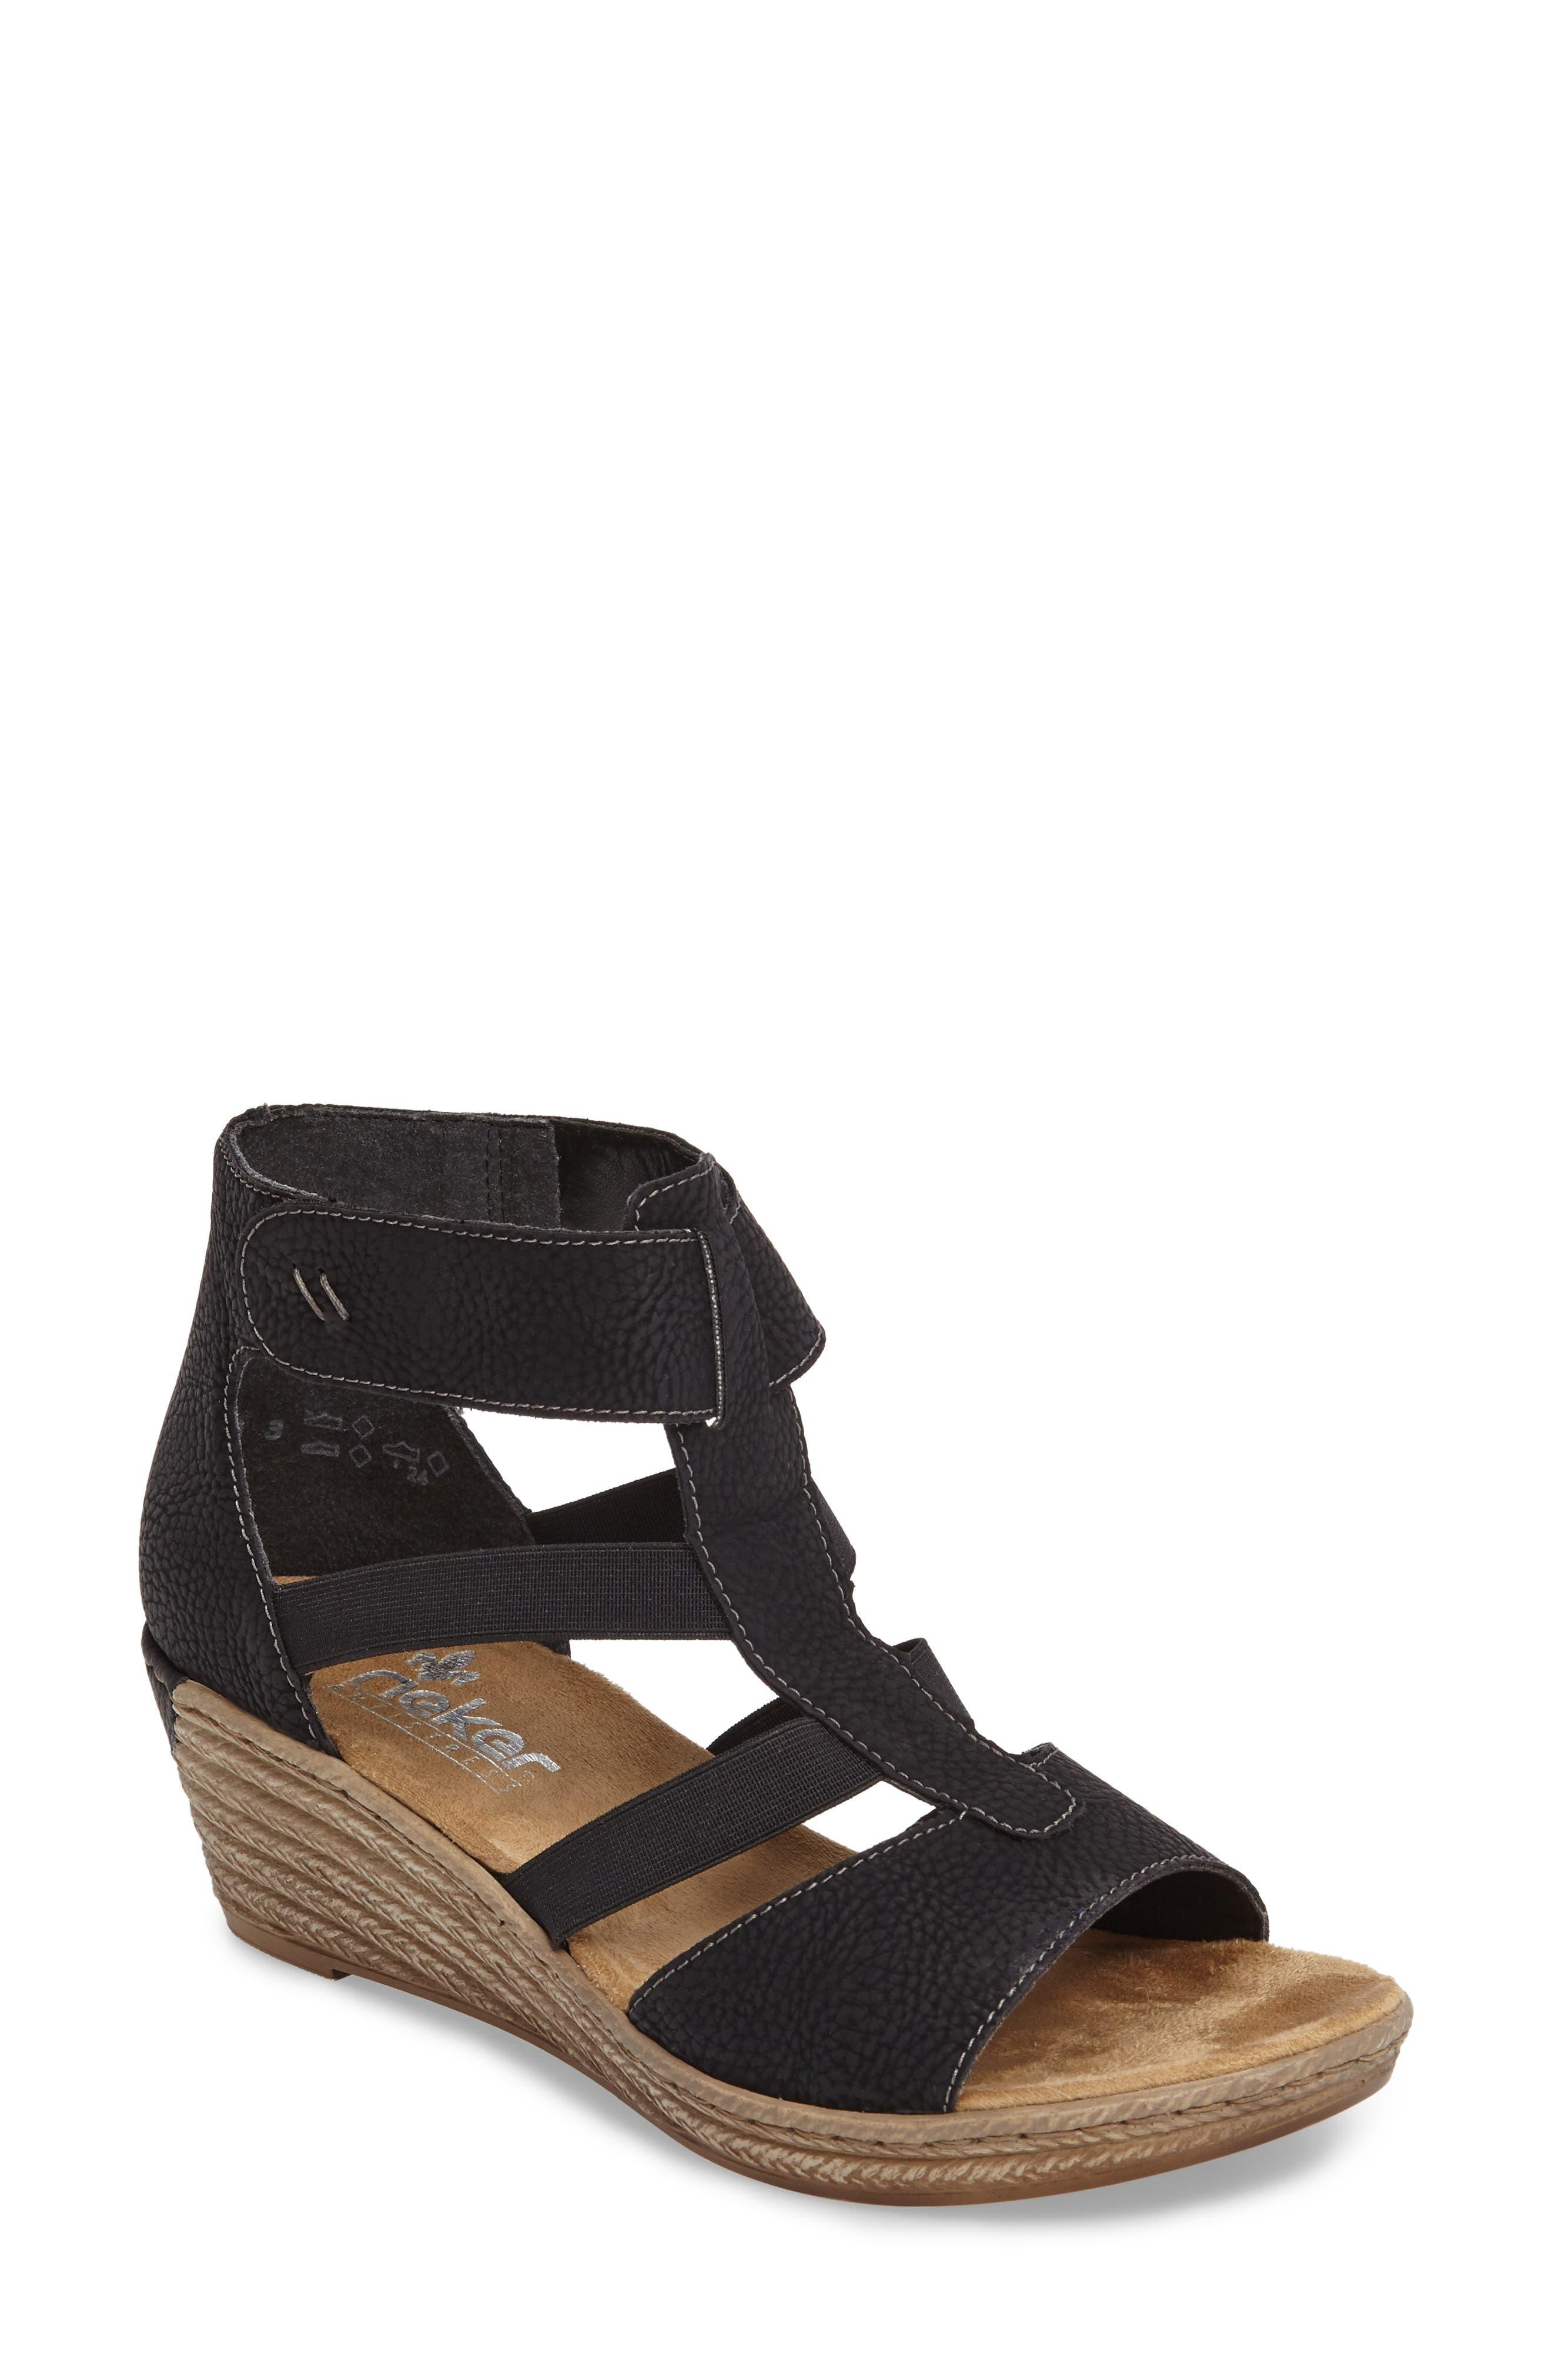 Rieker Antistress Fanni 39 Wedge Sandal (Women)